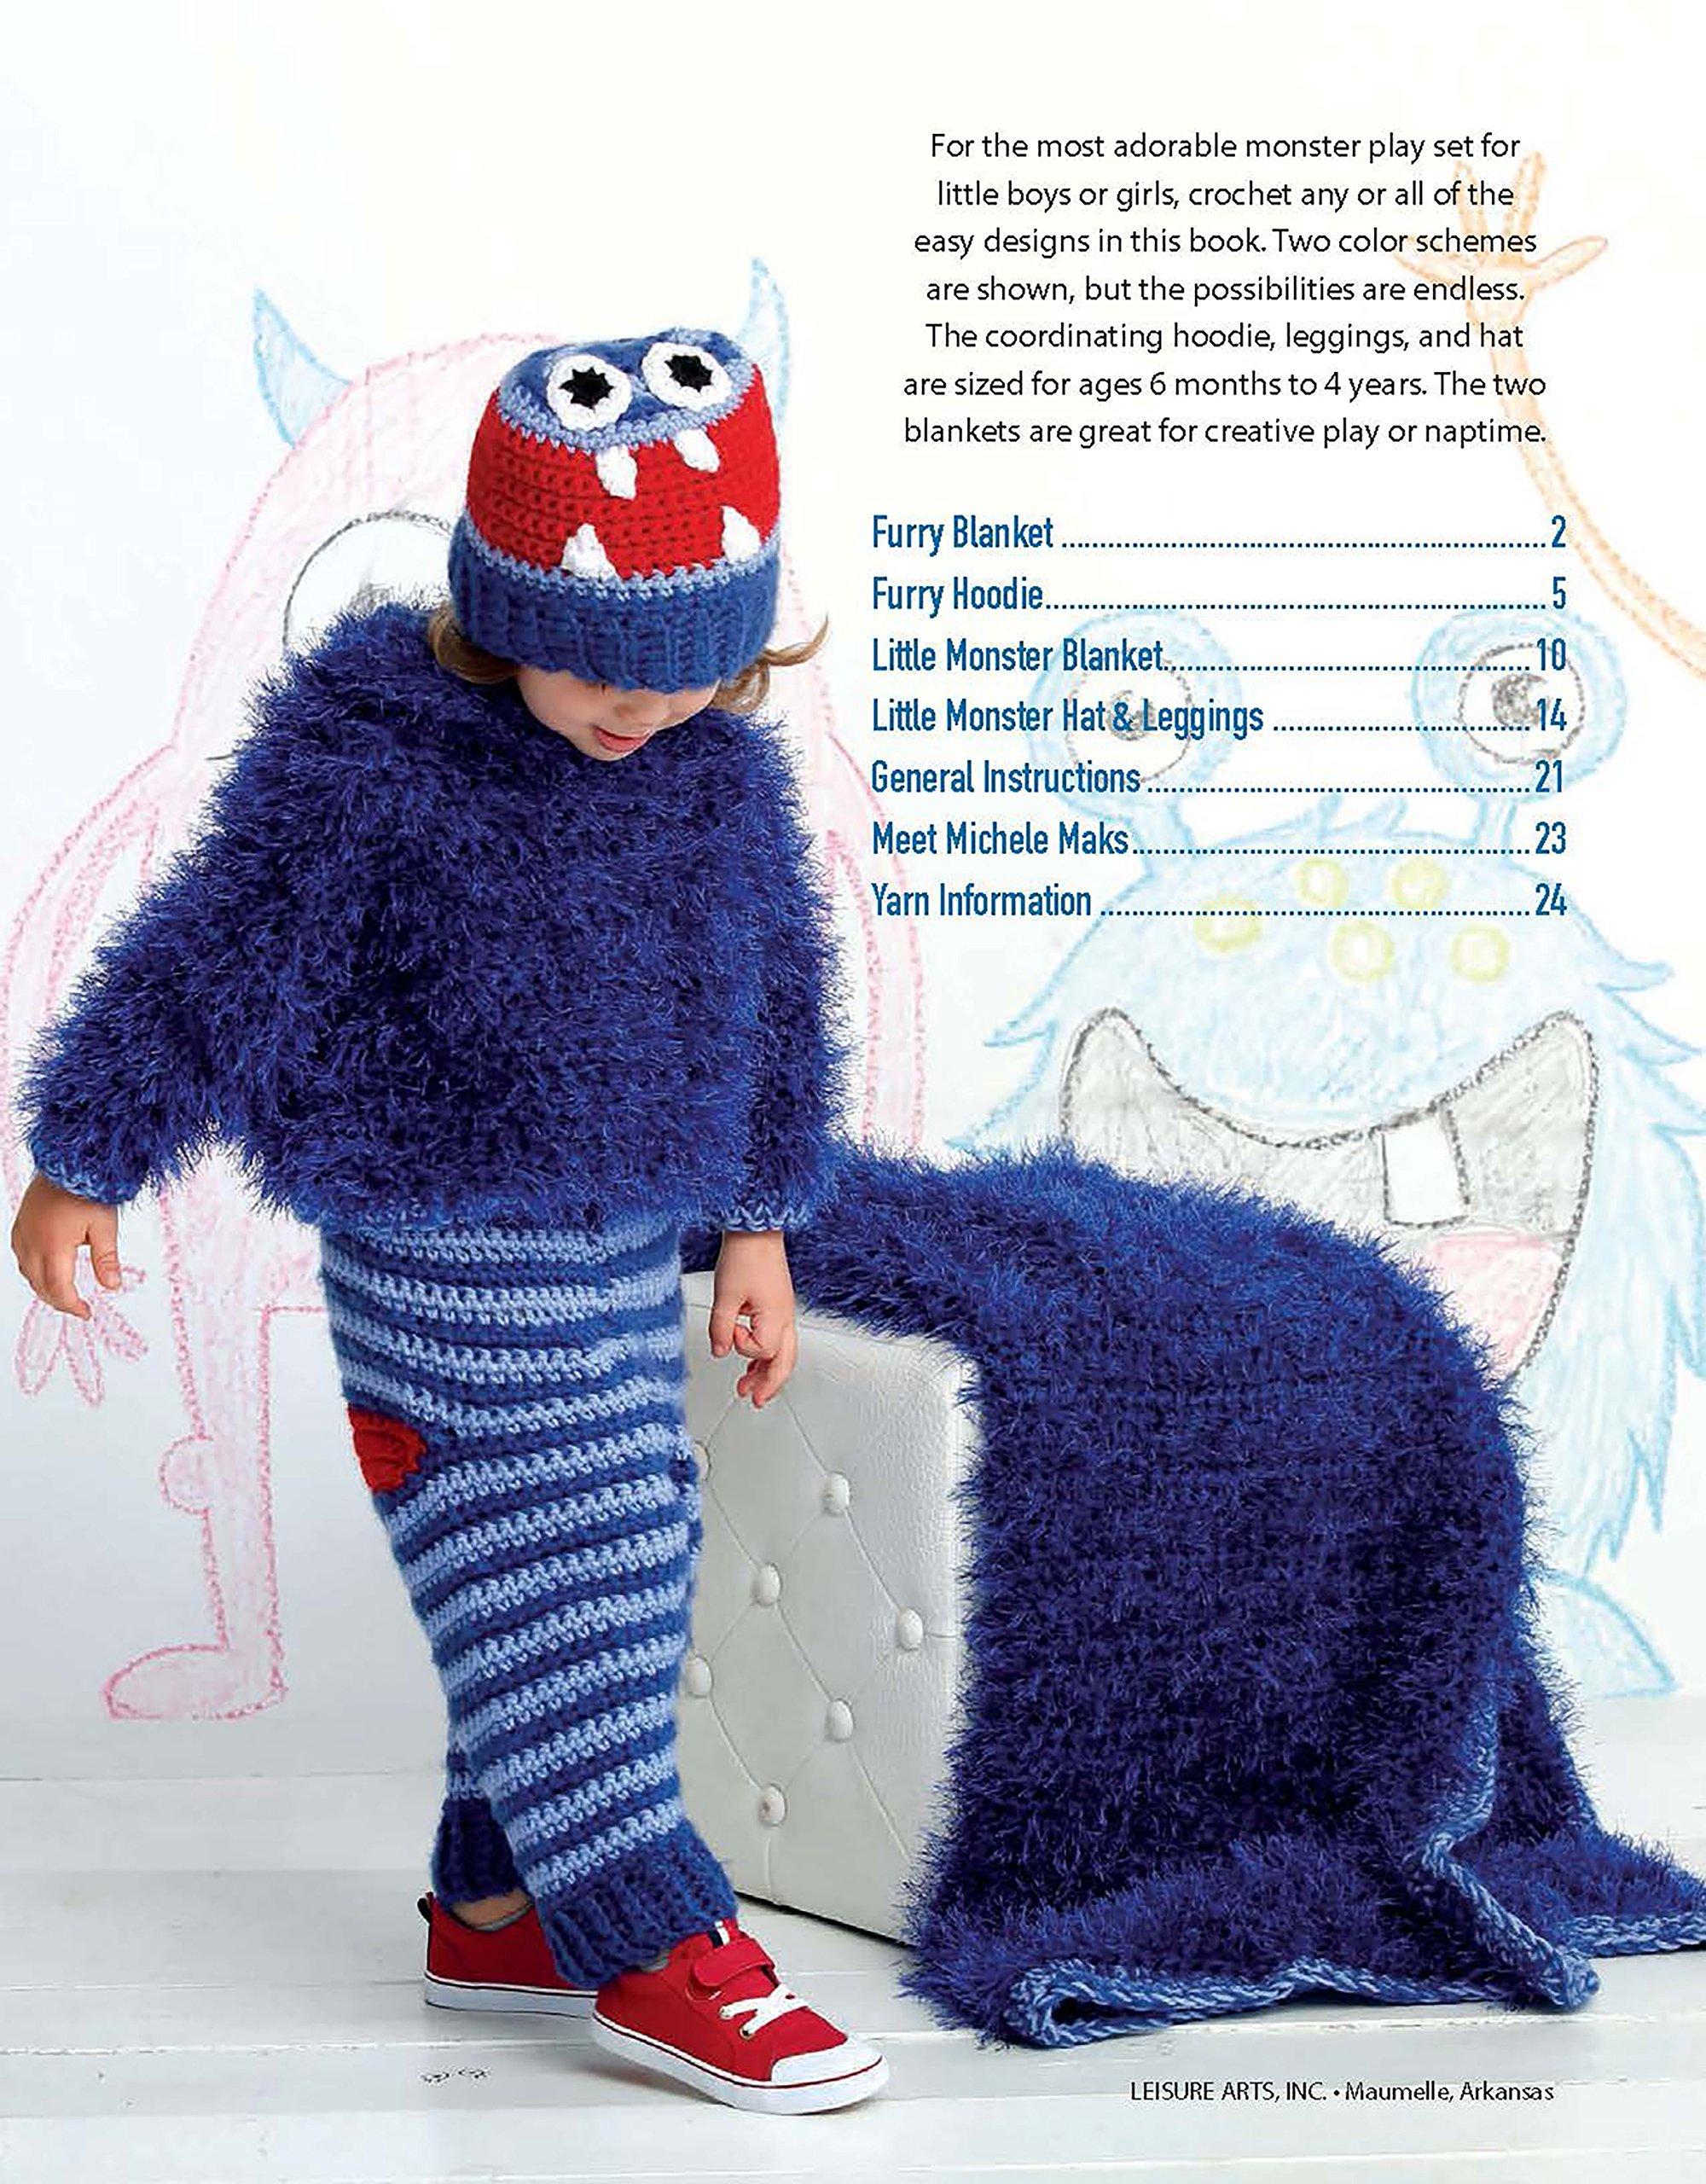 Monster Playsets Crochet Leisure Arts 7227 Michele Maks